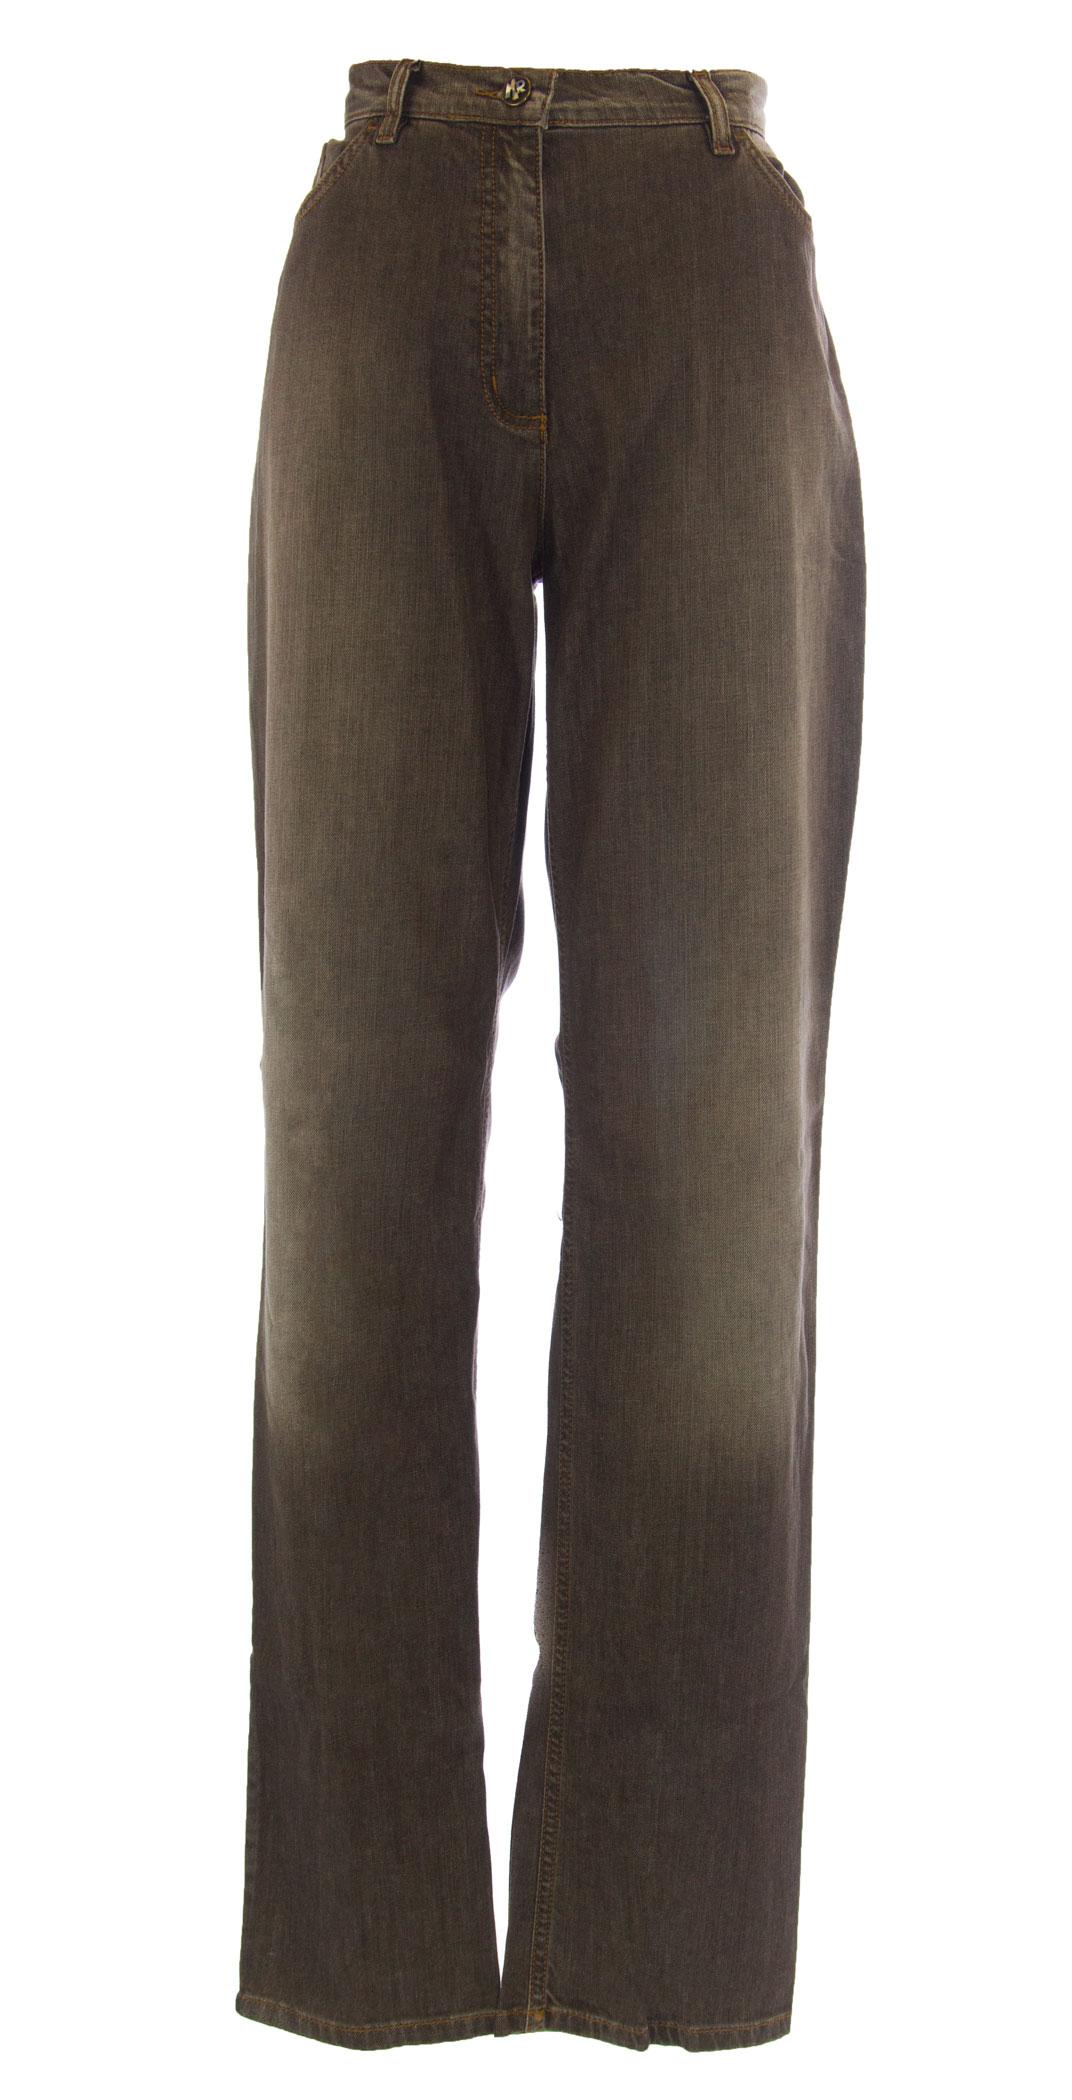 MARINA RINALDI by MaxMara Wami Brown Straight Leg Jeans  350 NWT